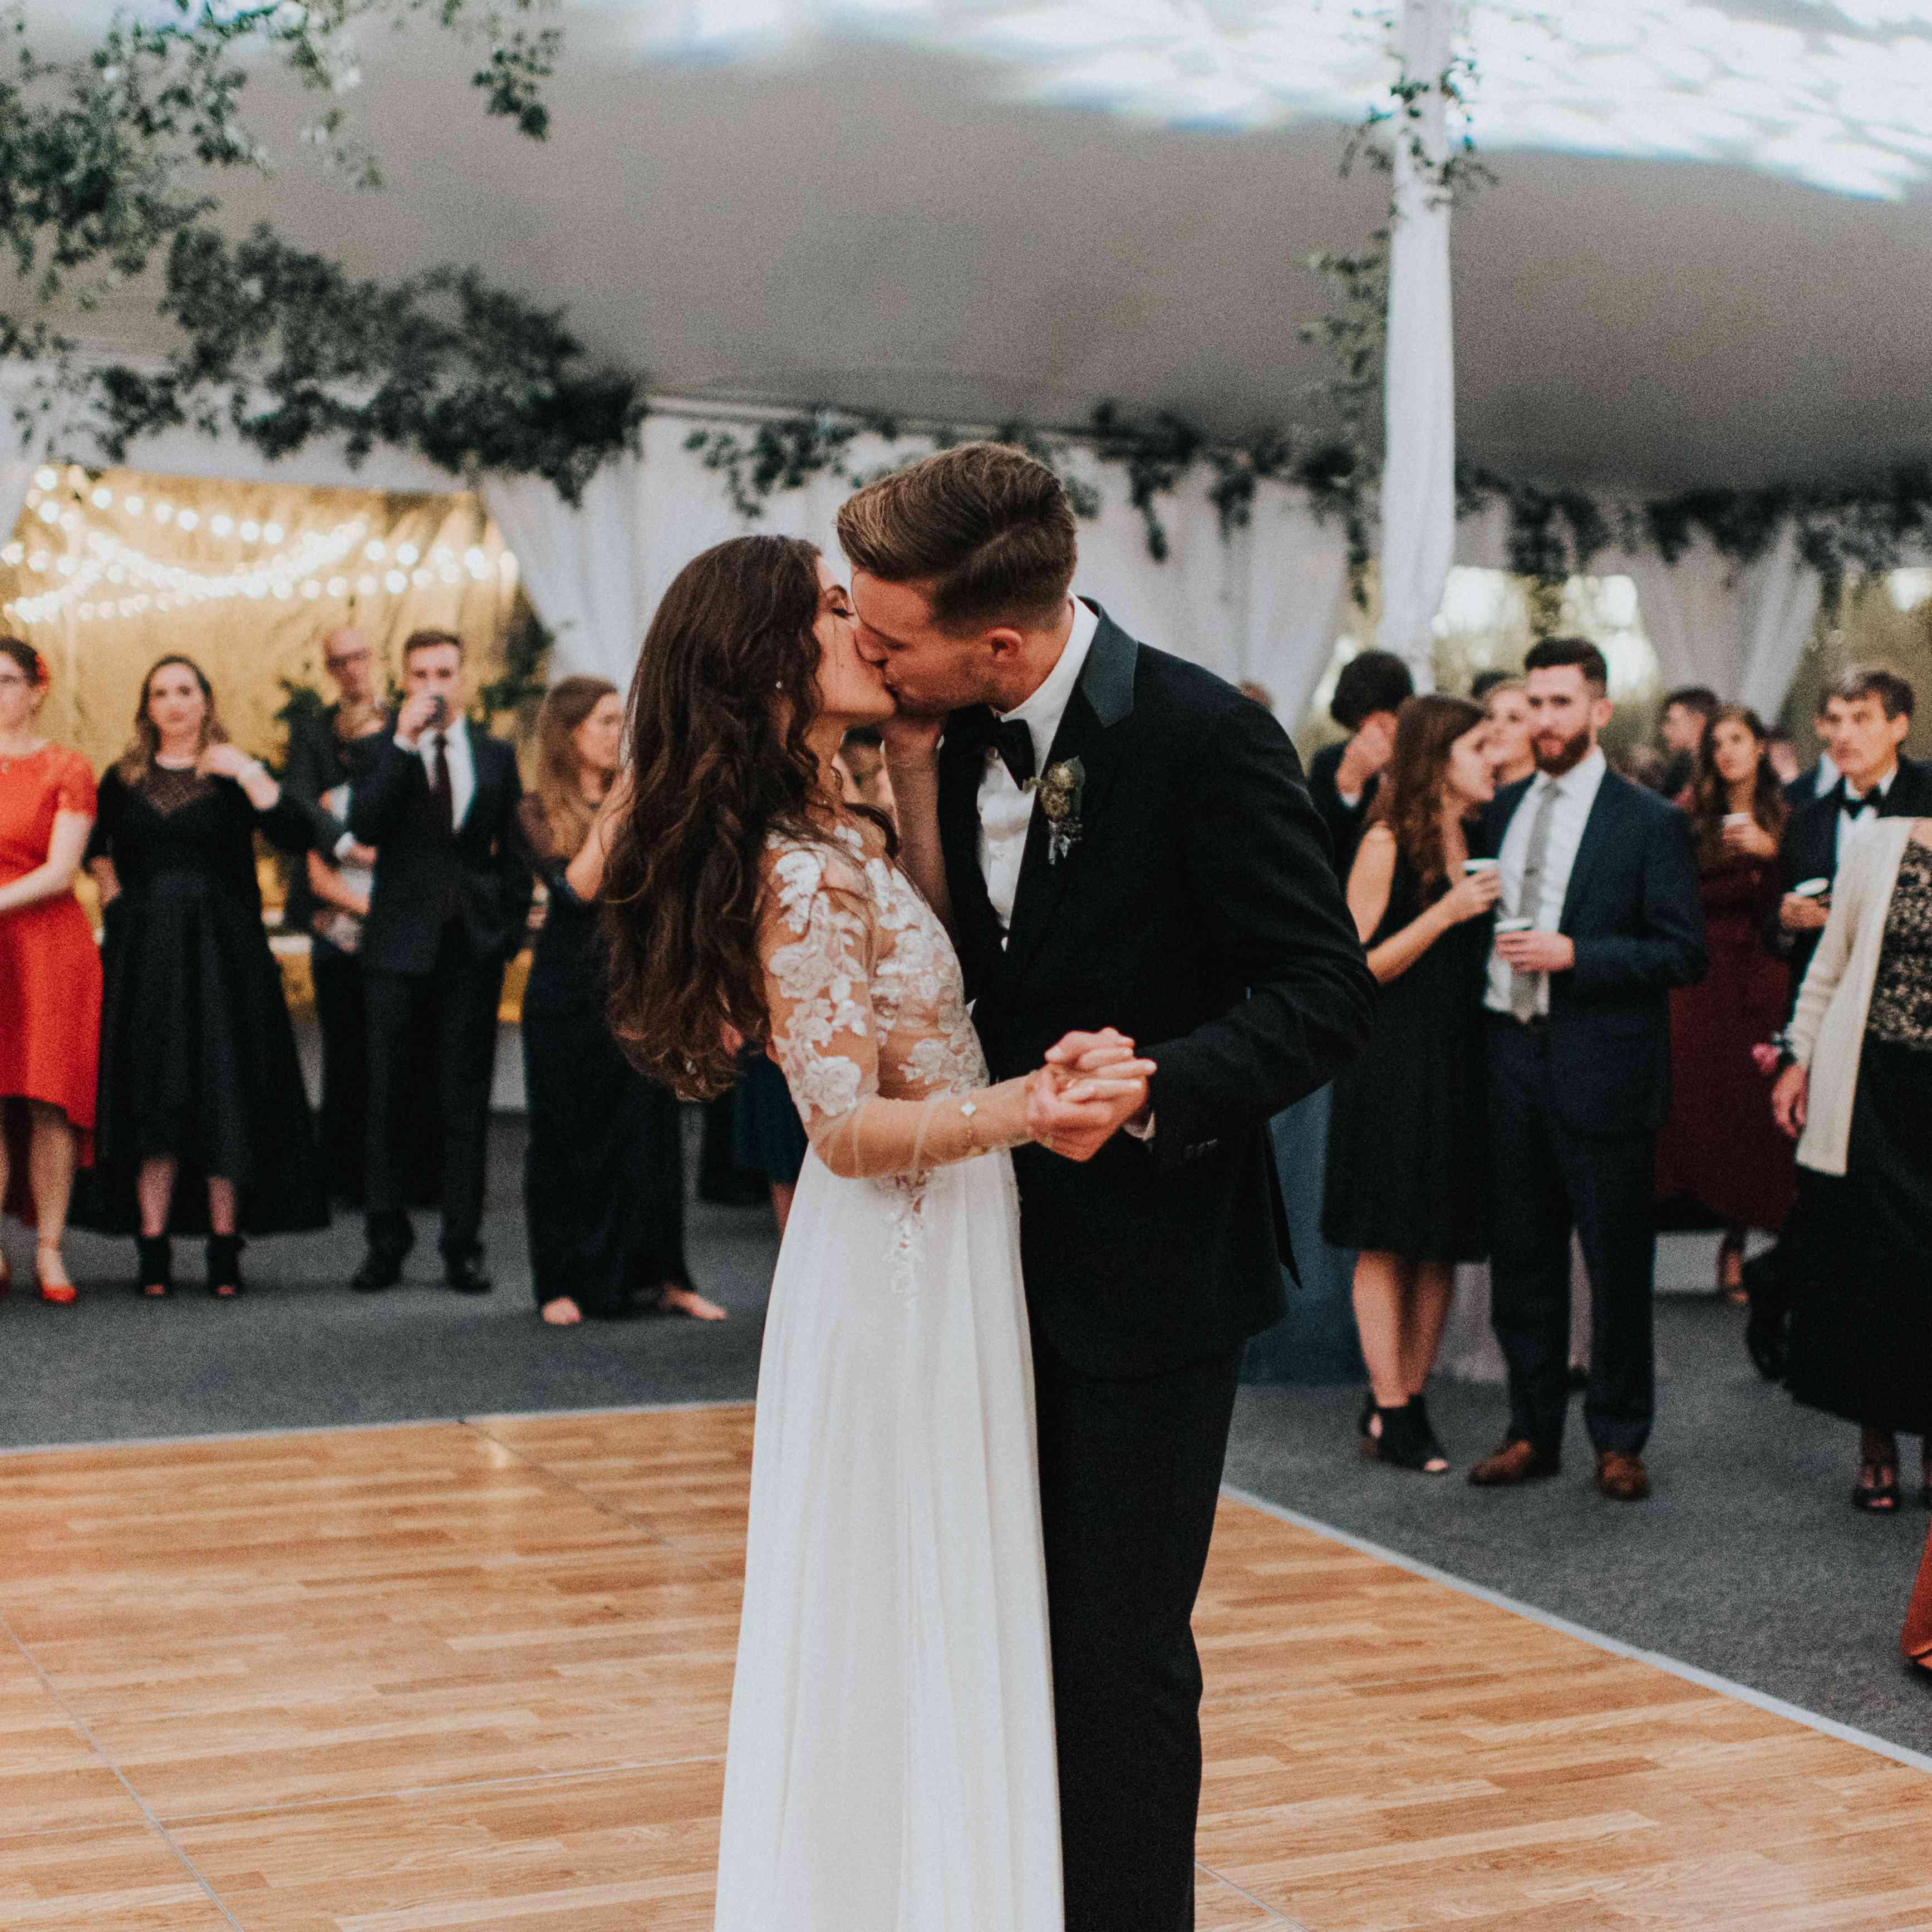 personalized michigan wedding, bride groom first dance